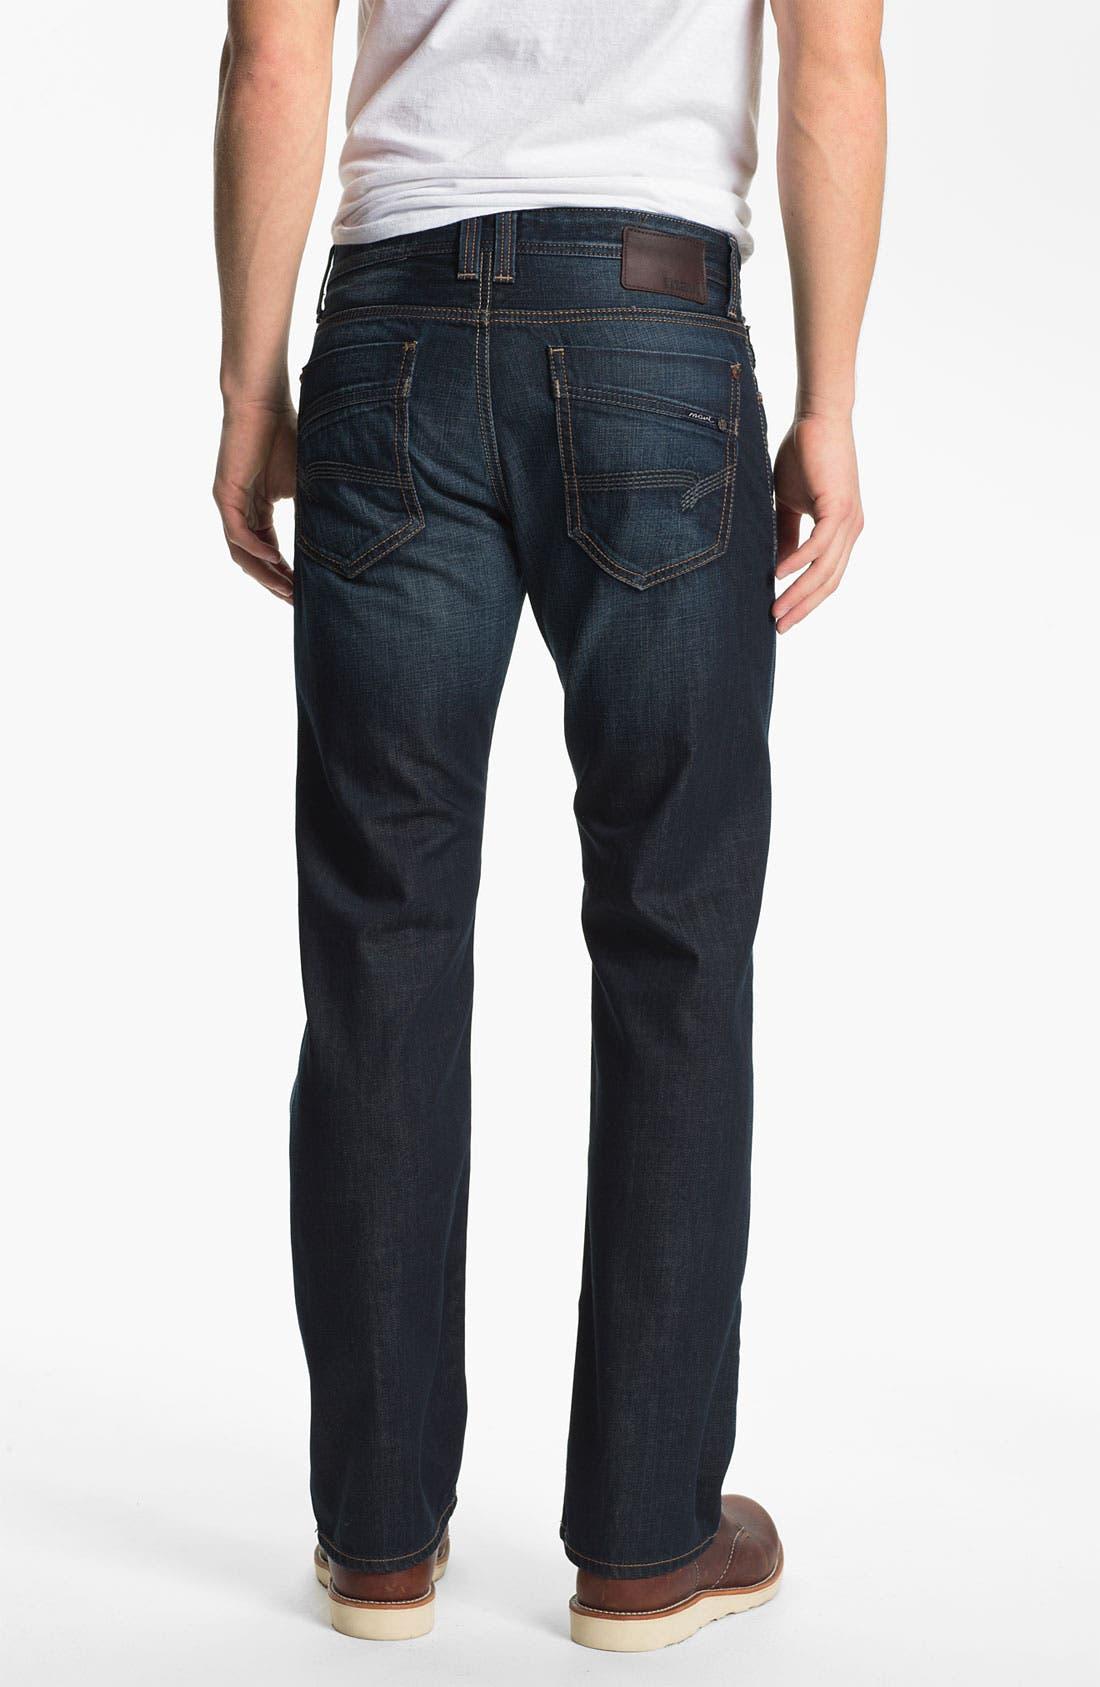 Alternate Image 1 Selected - Mavi Jeans 'Josh' Bootcut Jeans (Deep American Vintage)